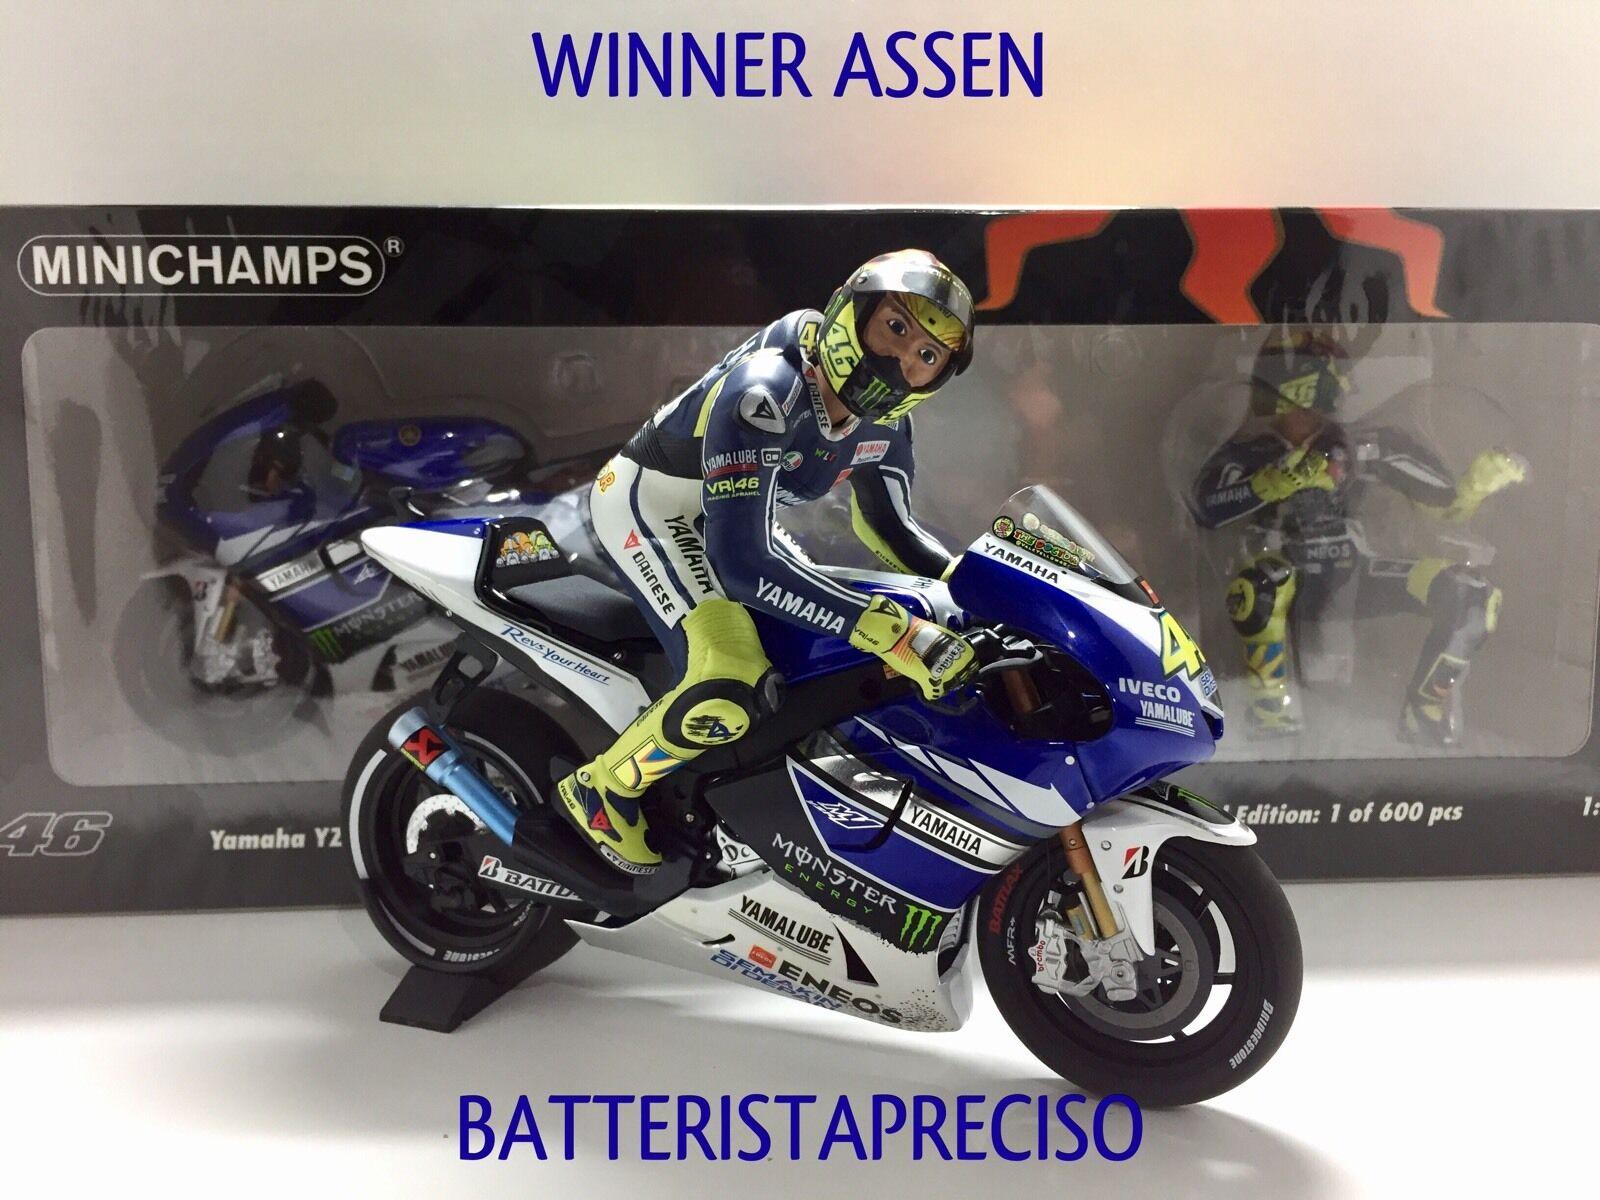 MINICHAMPS VALENTINO ROSSI 1 12 SET YAMAHA + FIGURE 2013 WINNER GP ASSEN NEW